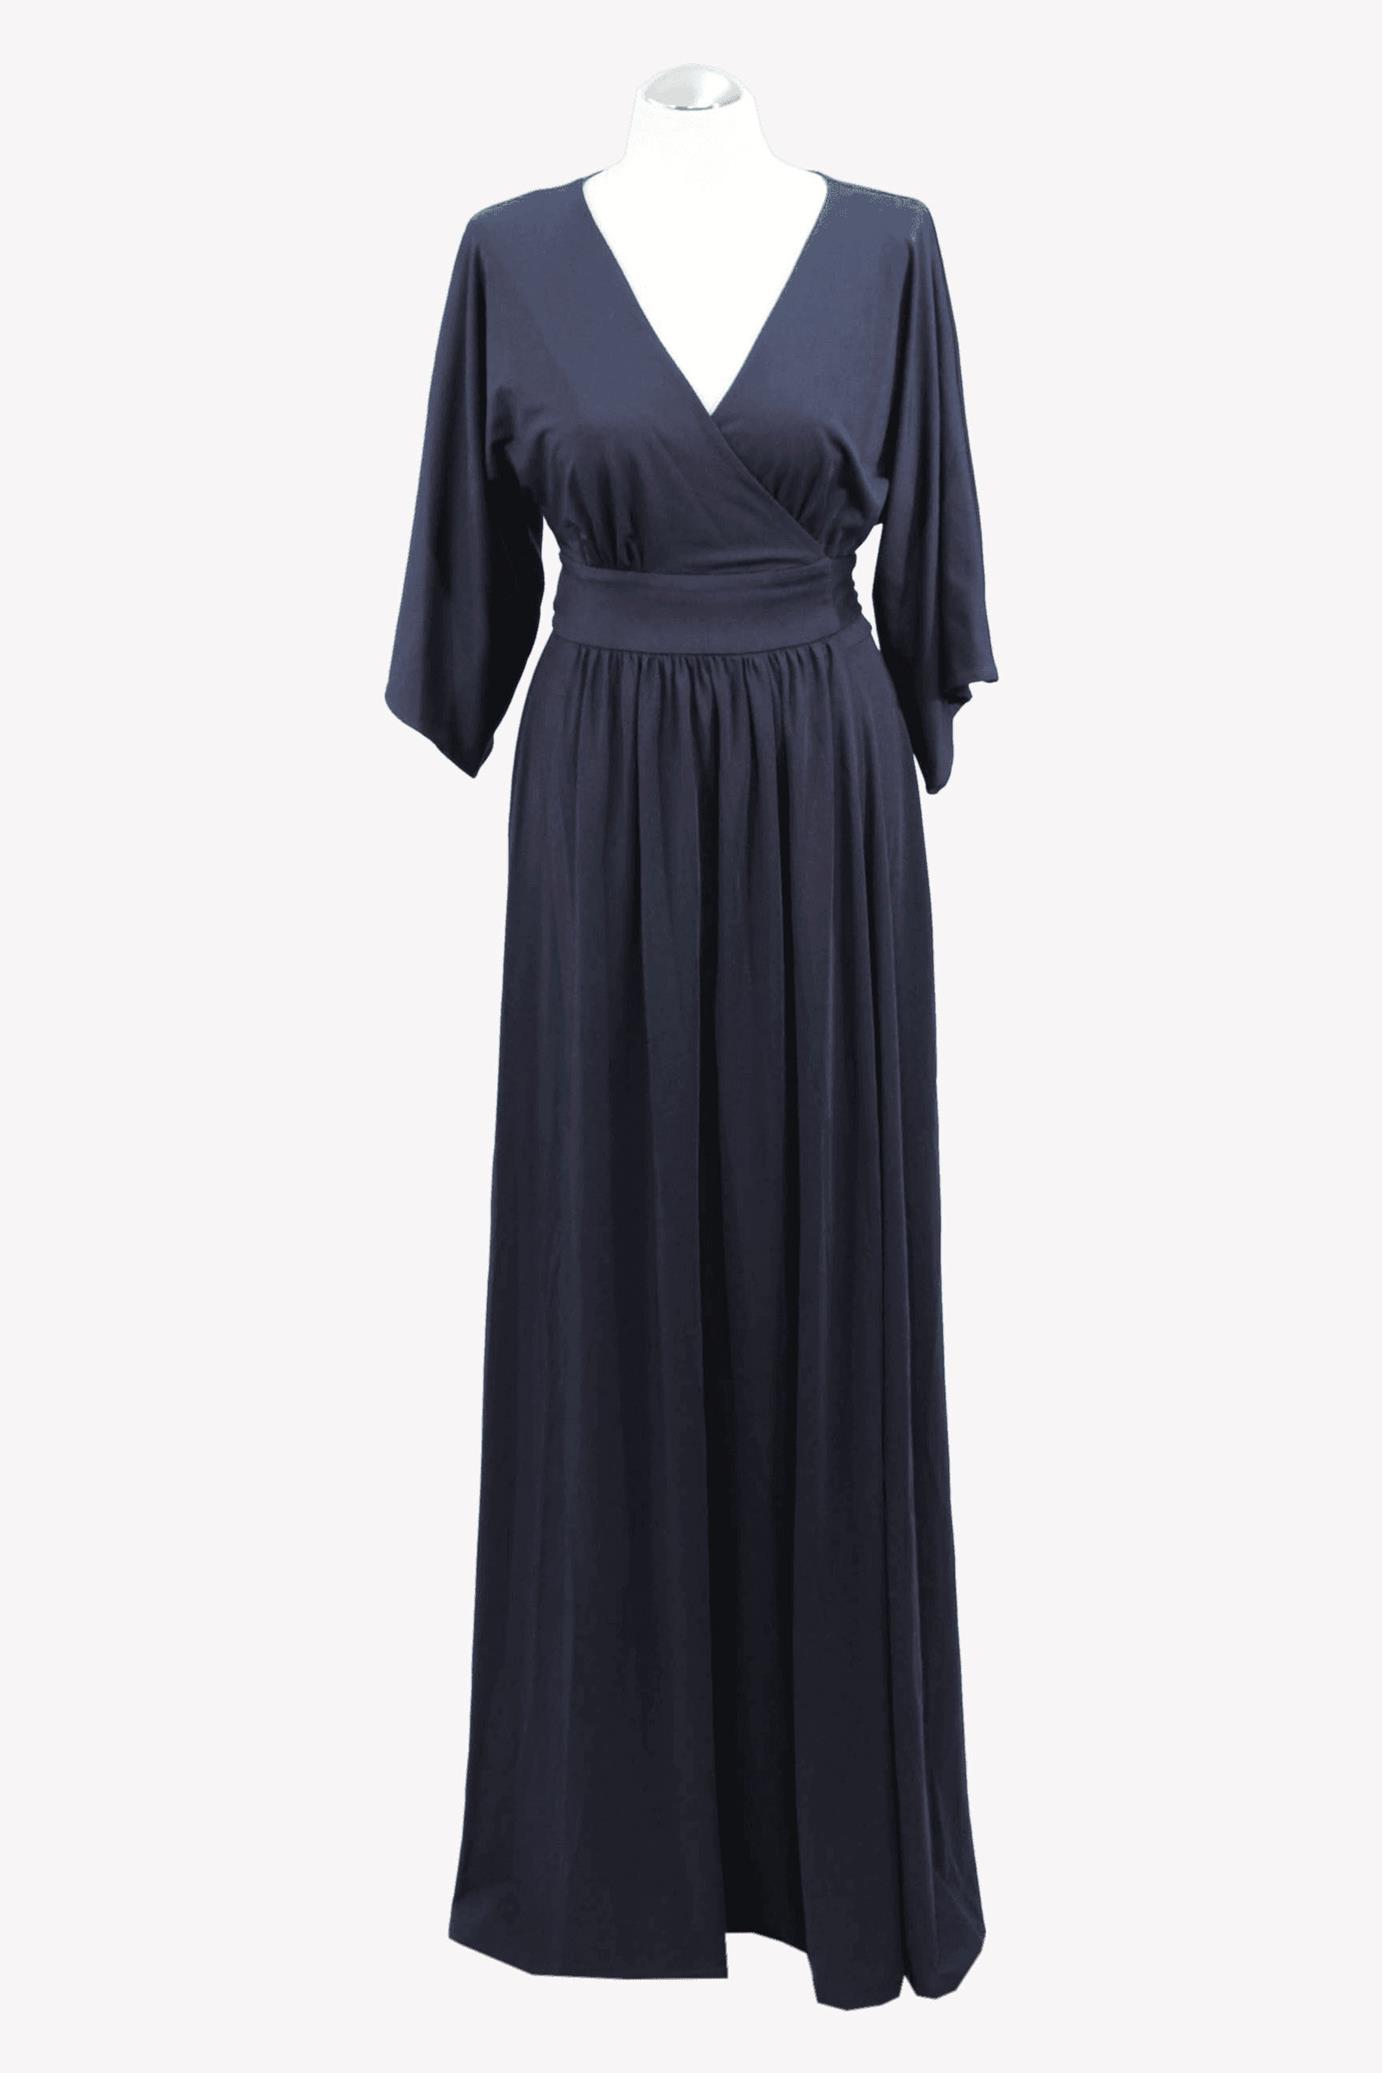 By Malina Kleid in Blau aus AG8751 AG8751.1